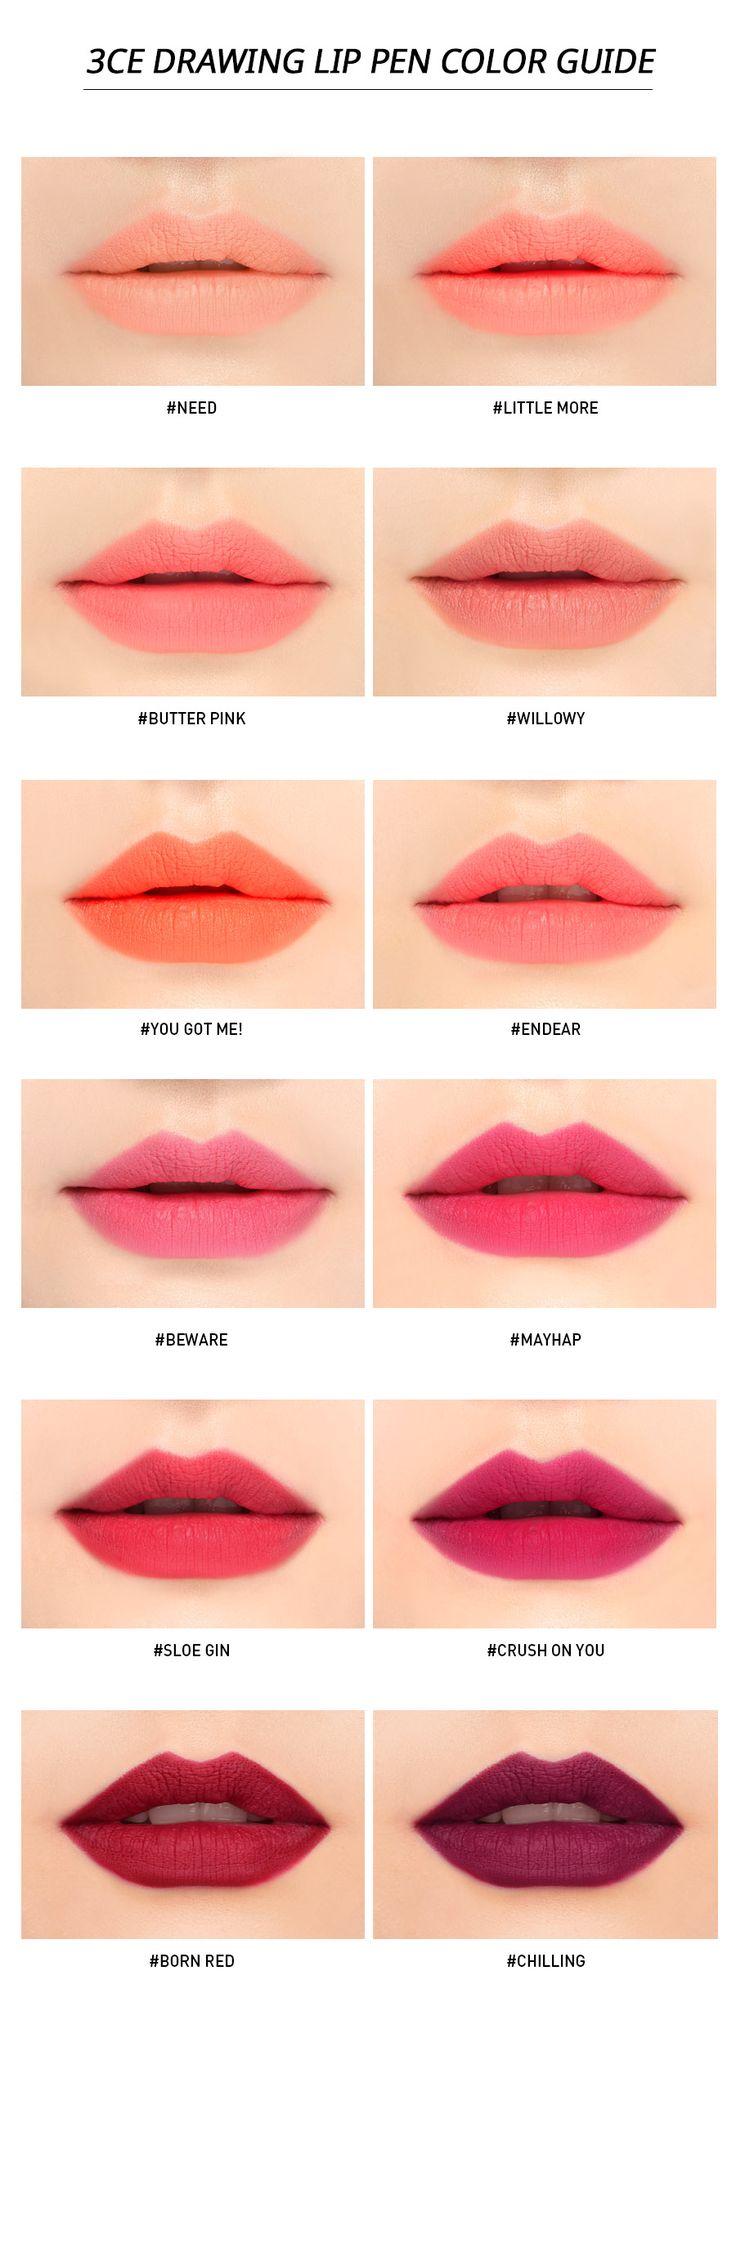 Tonymoly: cherry lip balms; Peripera: cushion blush; 3CE: ombré blusher, moving mascara; Étude house: tint my brows gel;